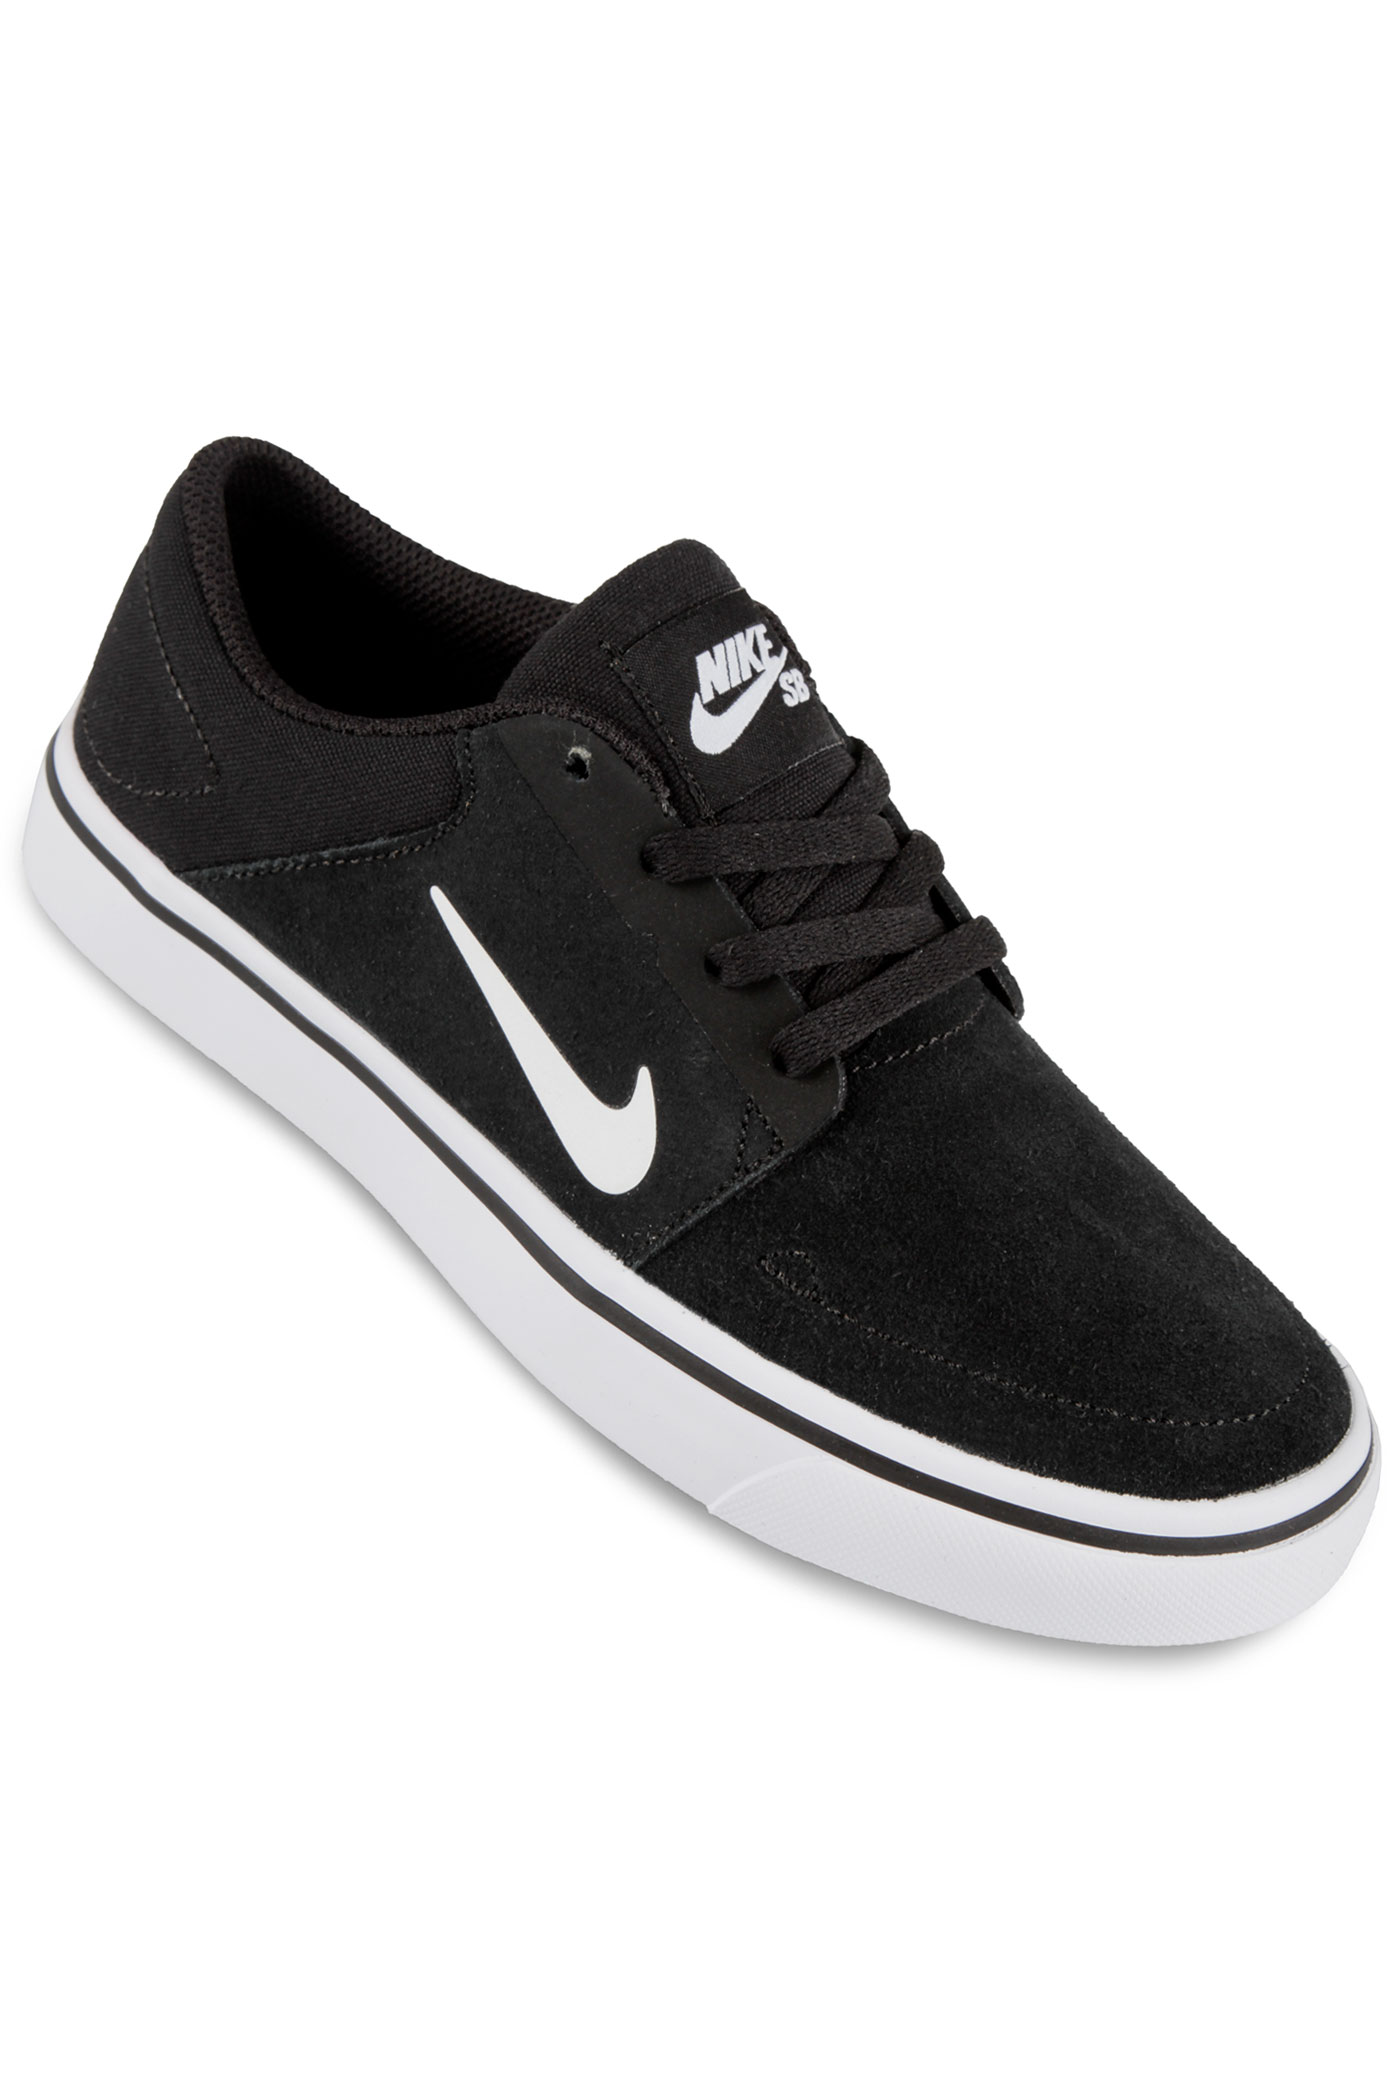 Nike Sb Portmore Shoes Kids Black White Buy At Skatedeluxe